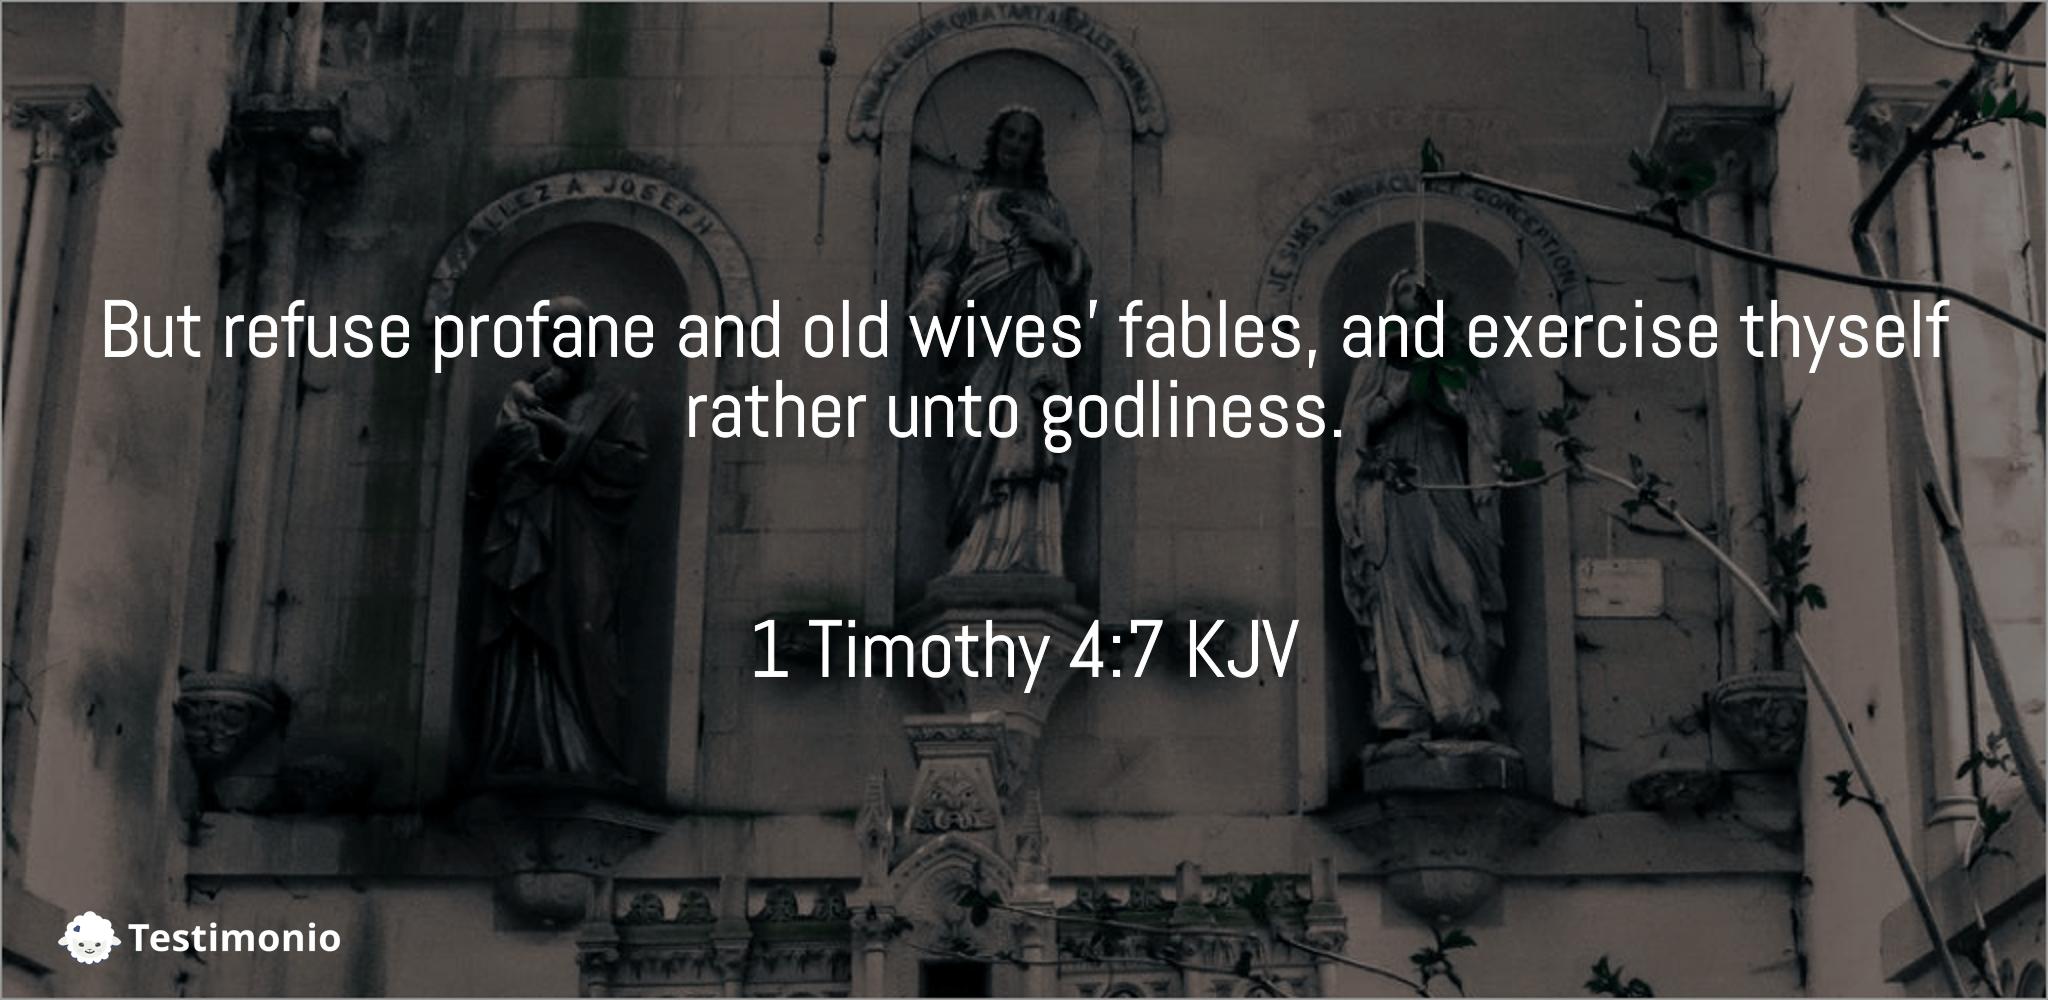 1 Timothy 4:7